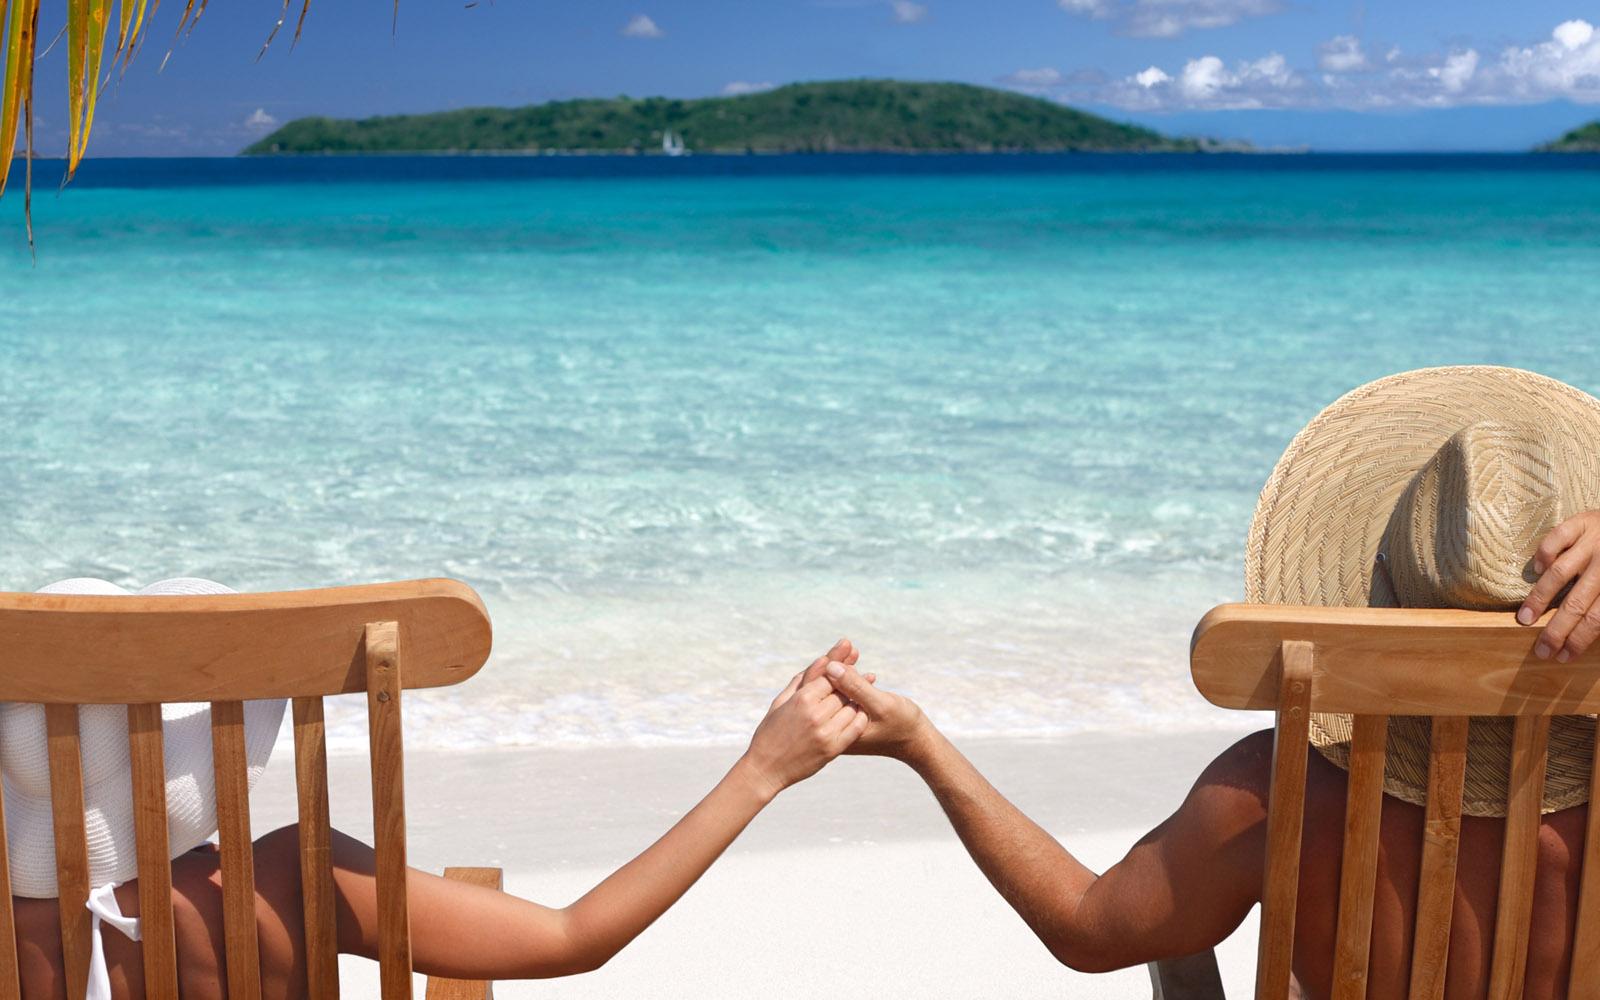 25-beach-couple-love-wallpaper